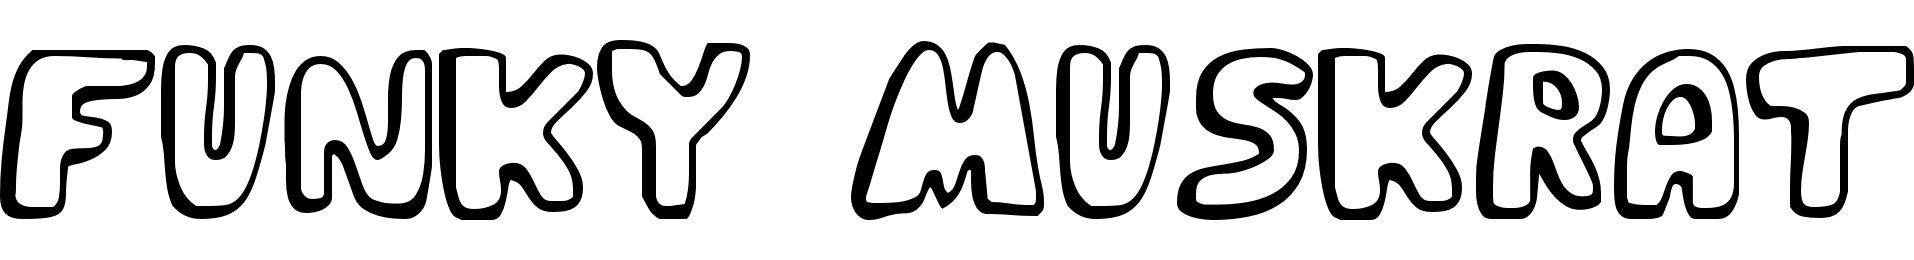 Funky Muskrat